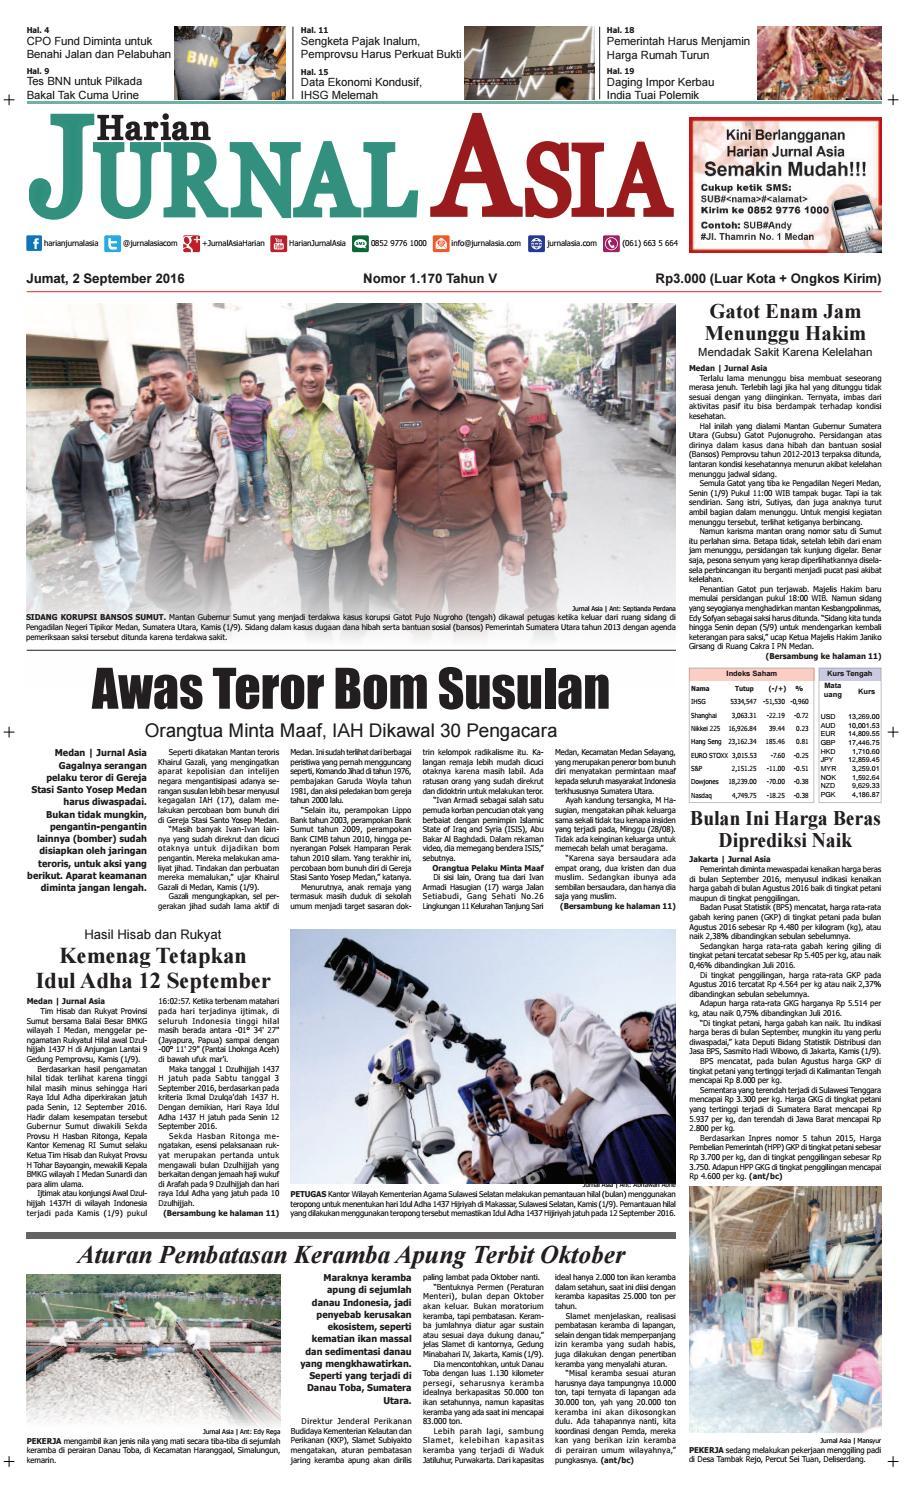 Harian Jurnal Asia Edisi Jumat 02 September 2016 By Kopi Bubuk Ridha Utama Smg Medan Issuu